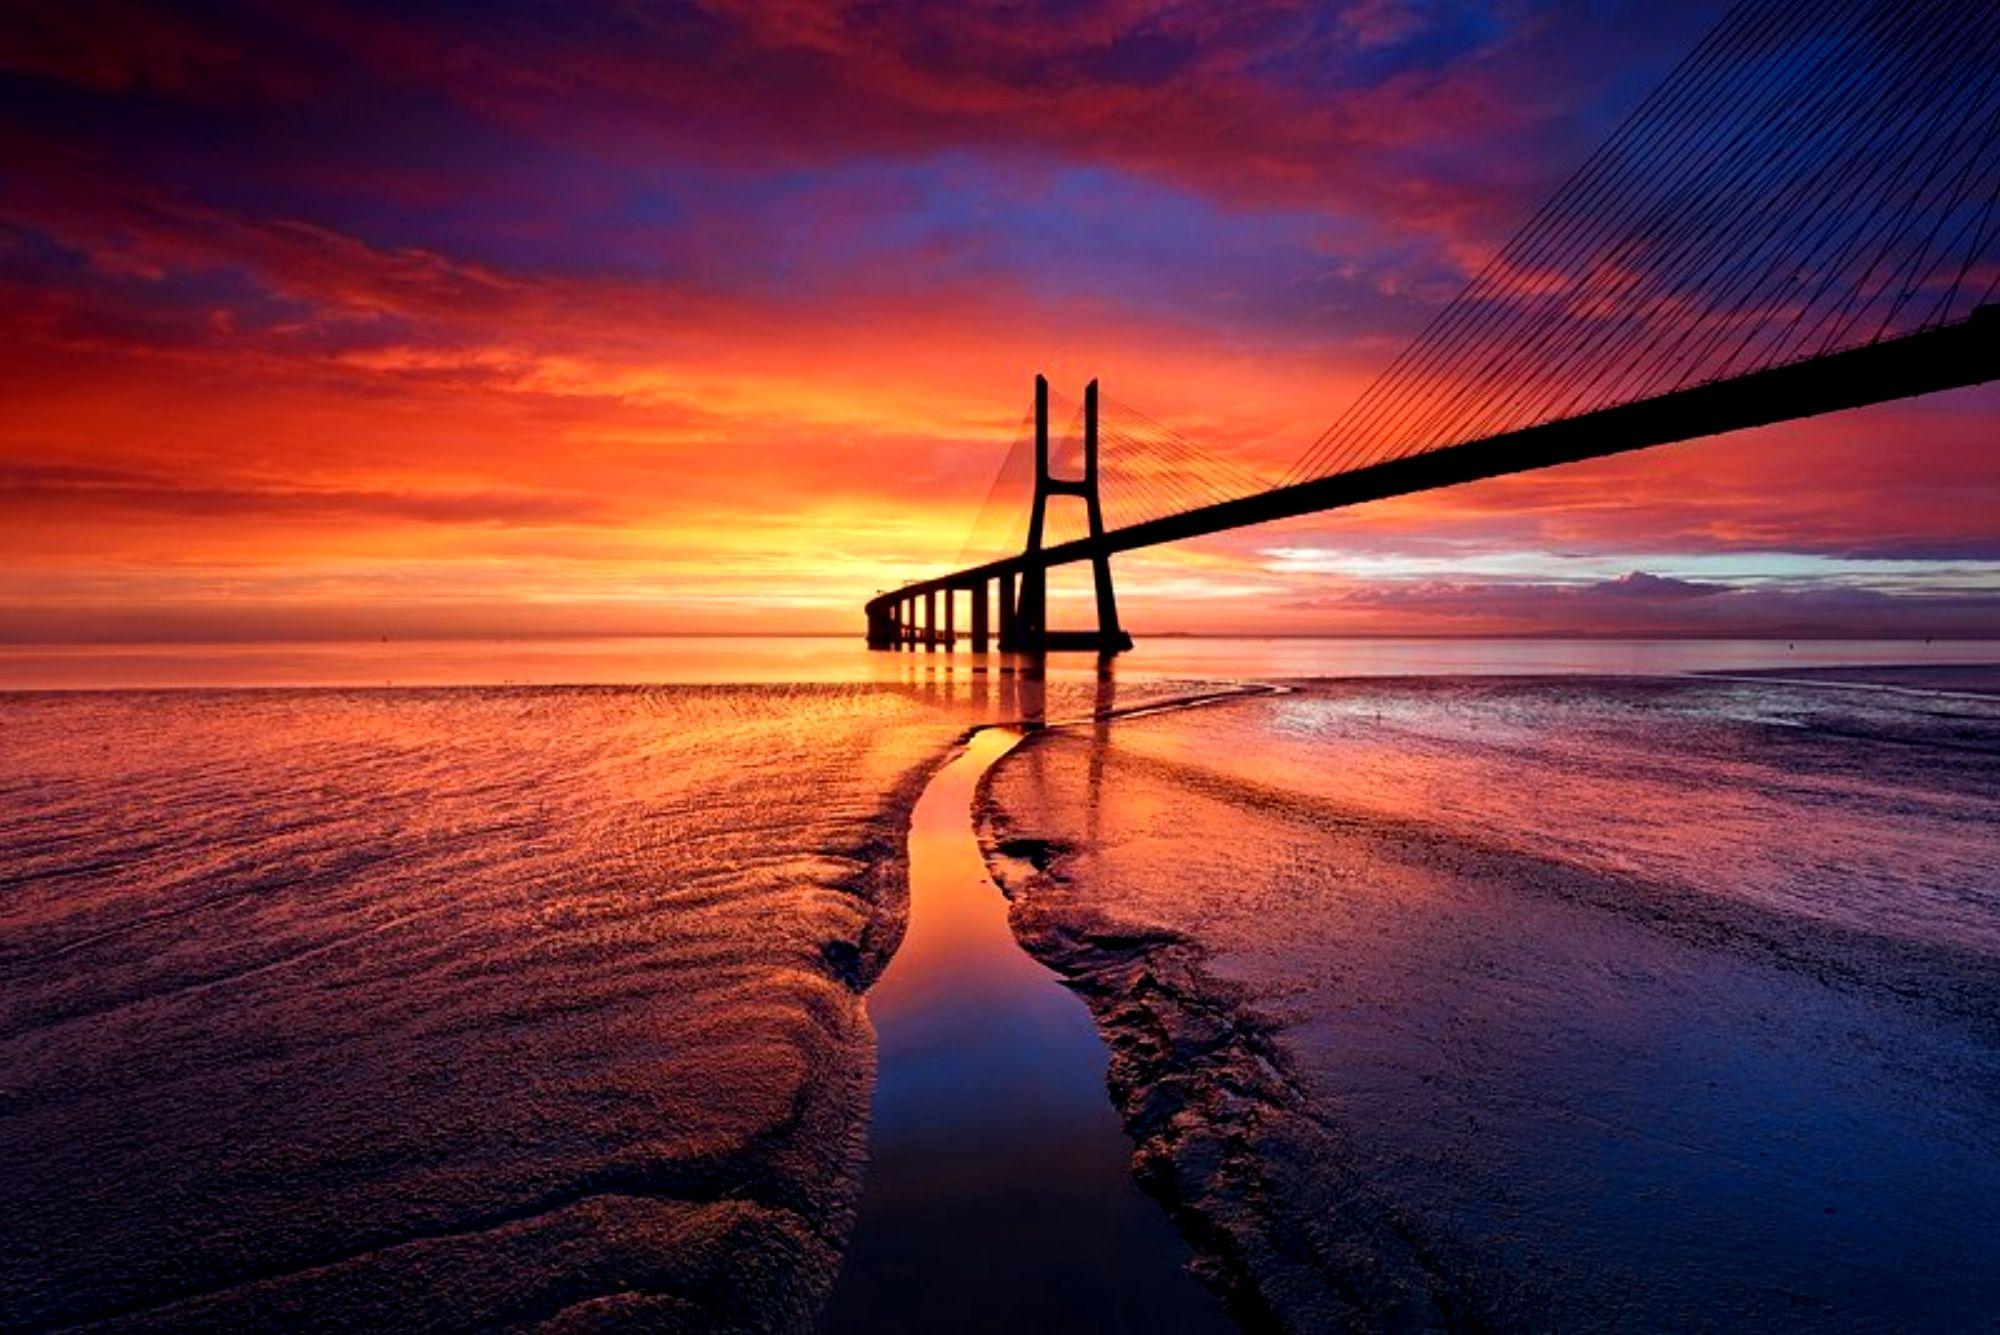 Vasco Da Gama Bridge Hd Wallpaper Background Image 2000x1335